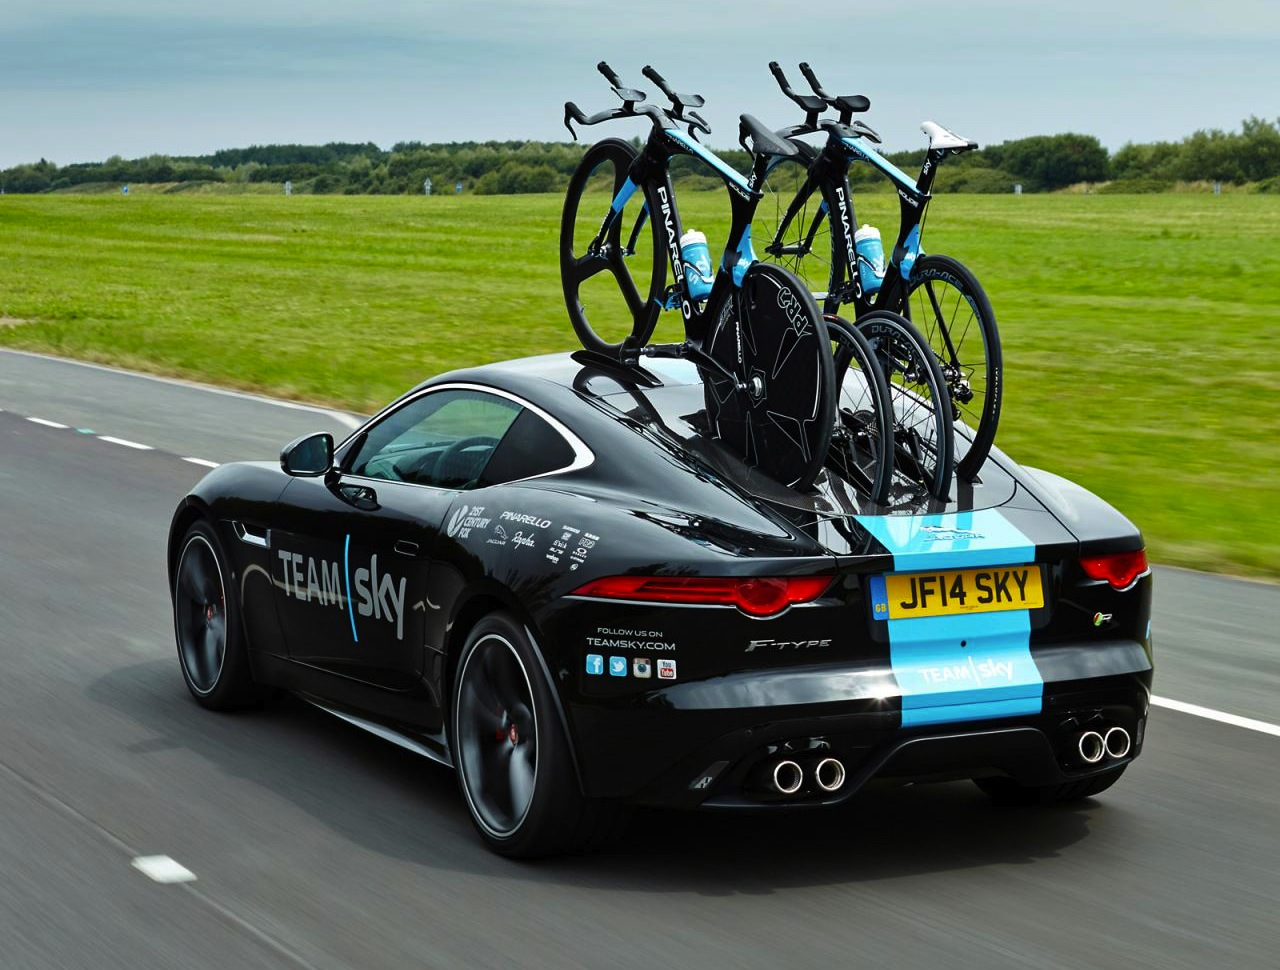 jaguar f type coupe acts as support car for tour de france performancedrive. Black Bedroom Furniture Sets. Home Design Ideas